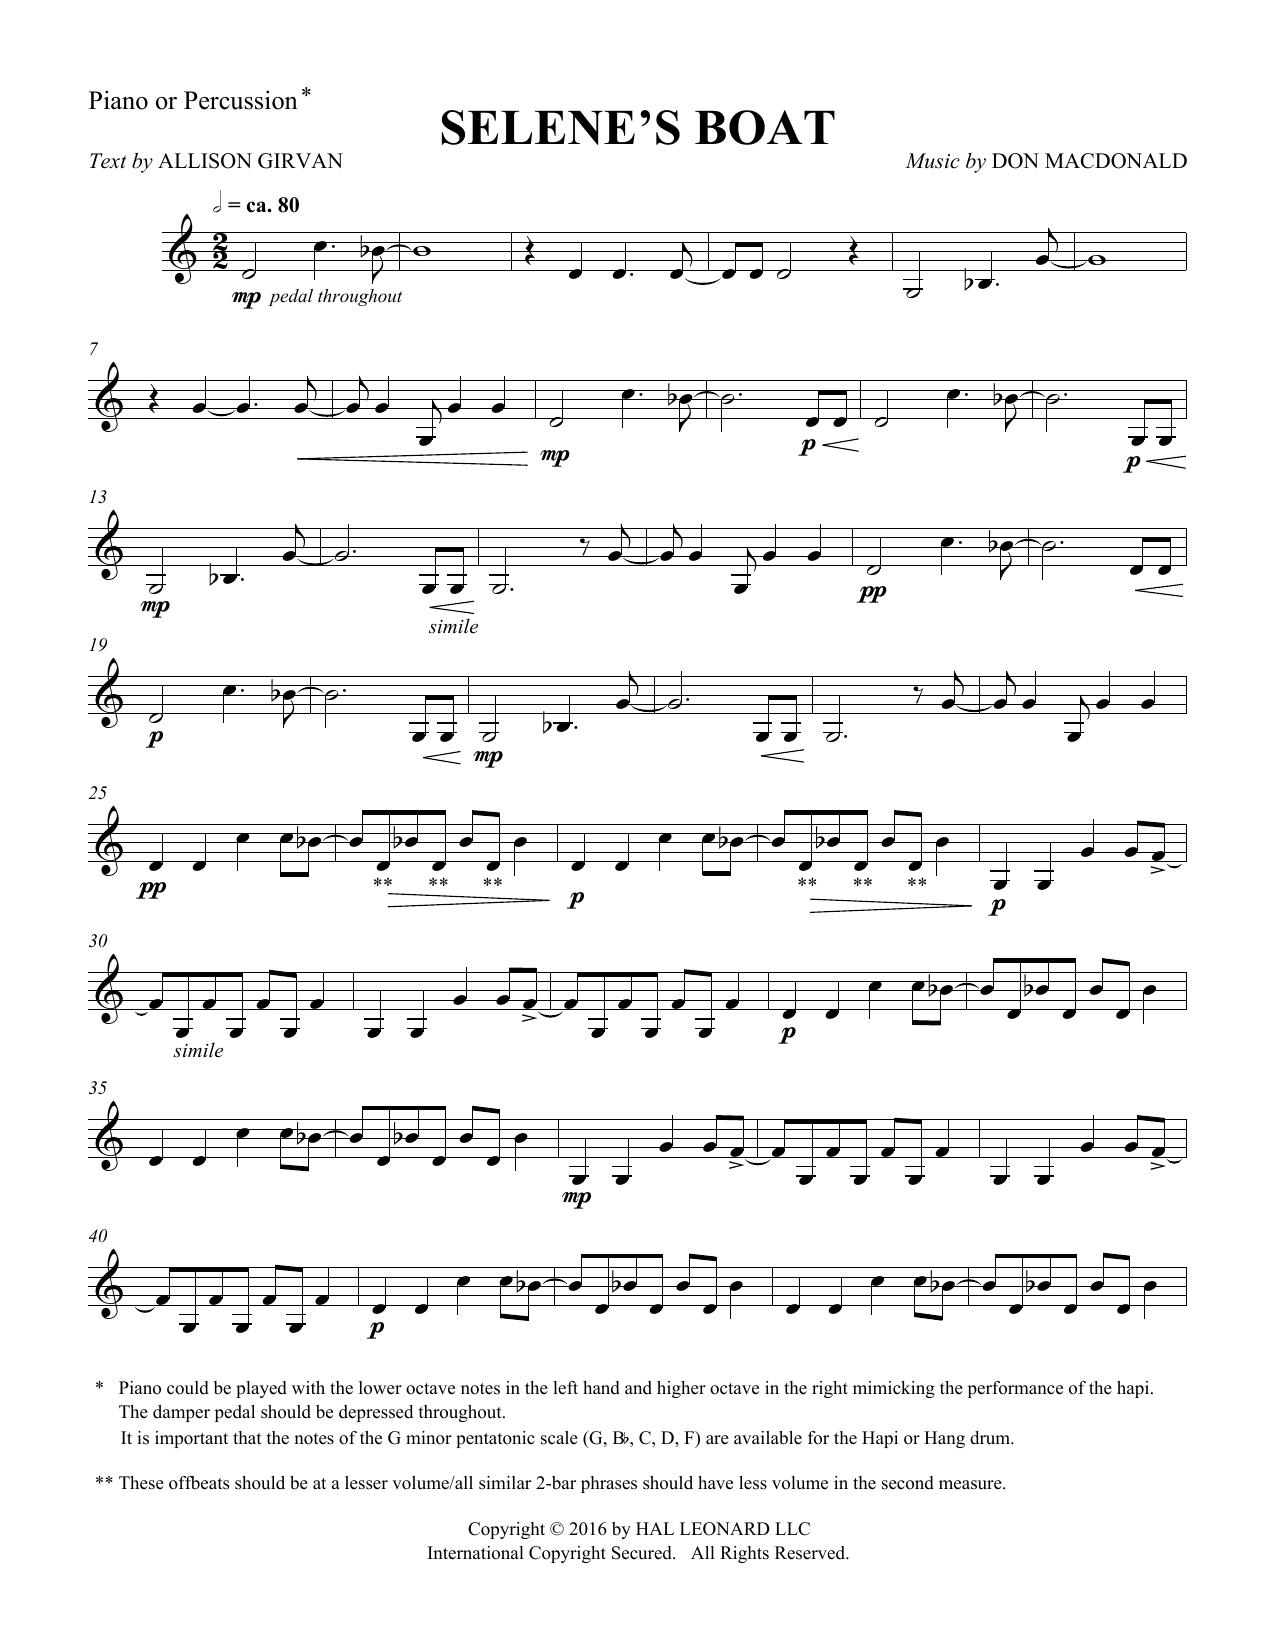 Selene's Boat - Percussion Sheet Music